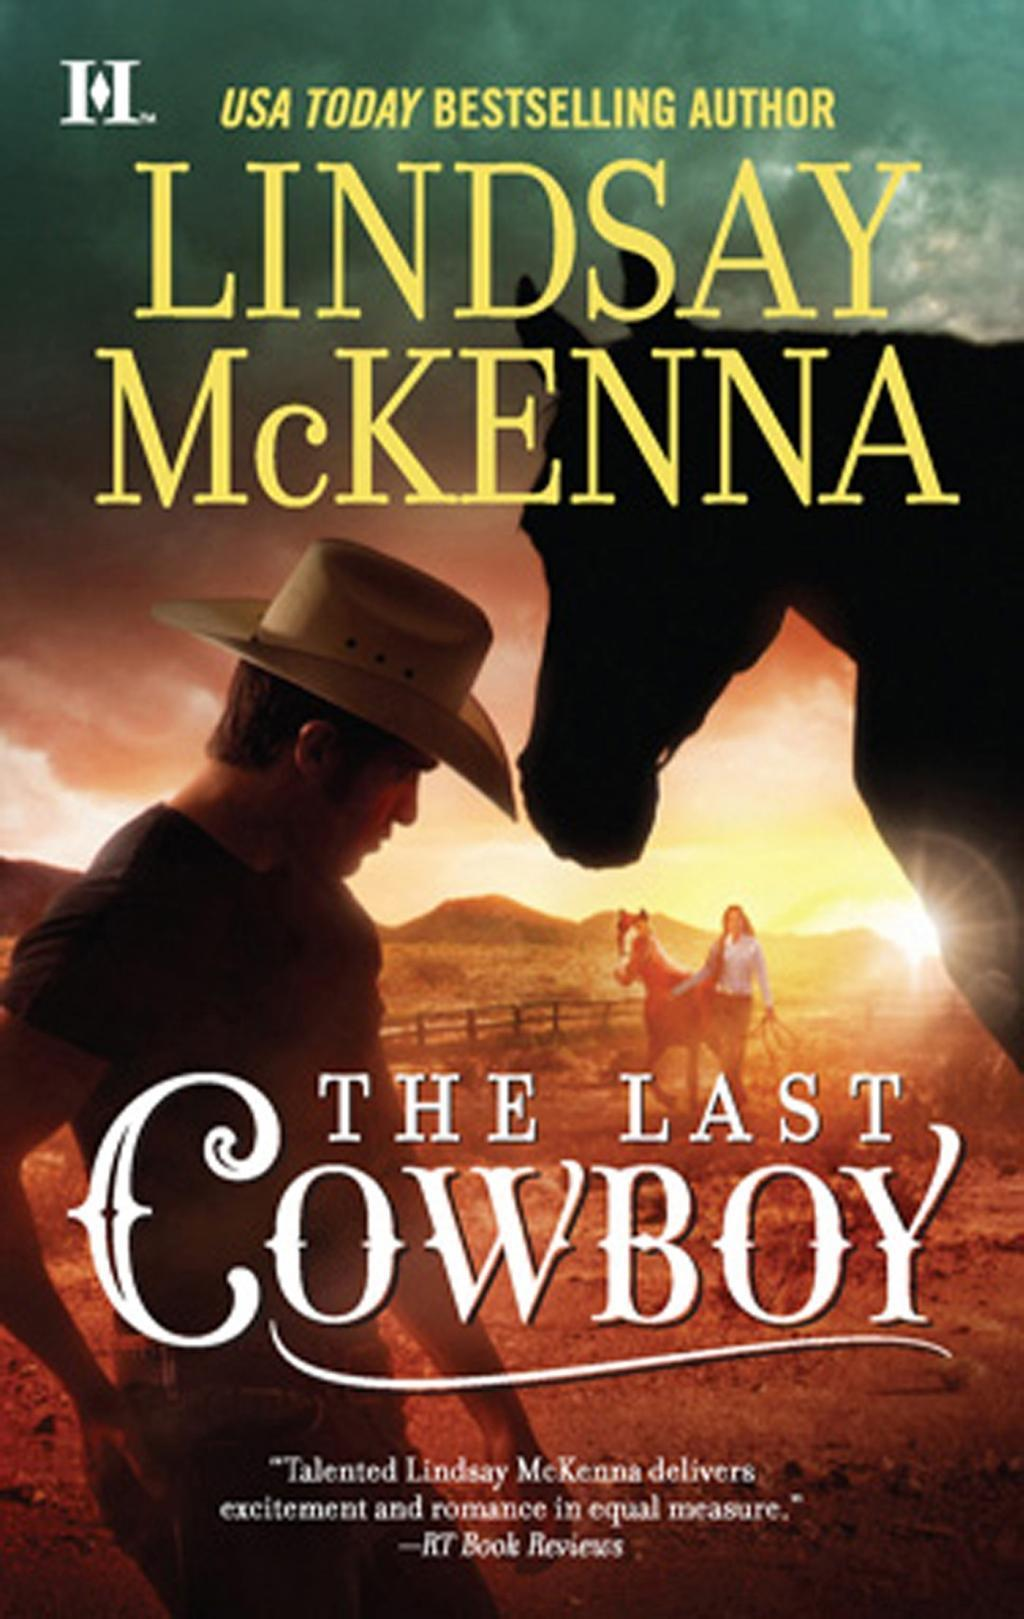 The Last Cowboy (Mills & Boon M&B)